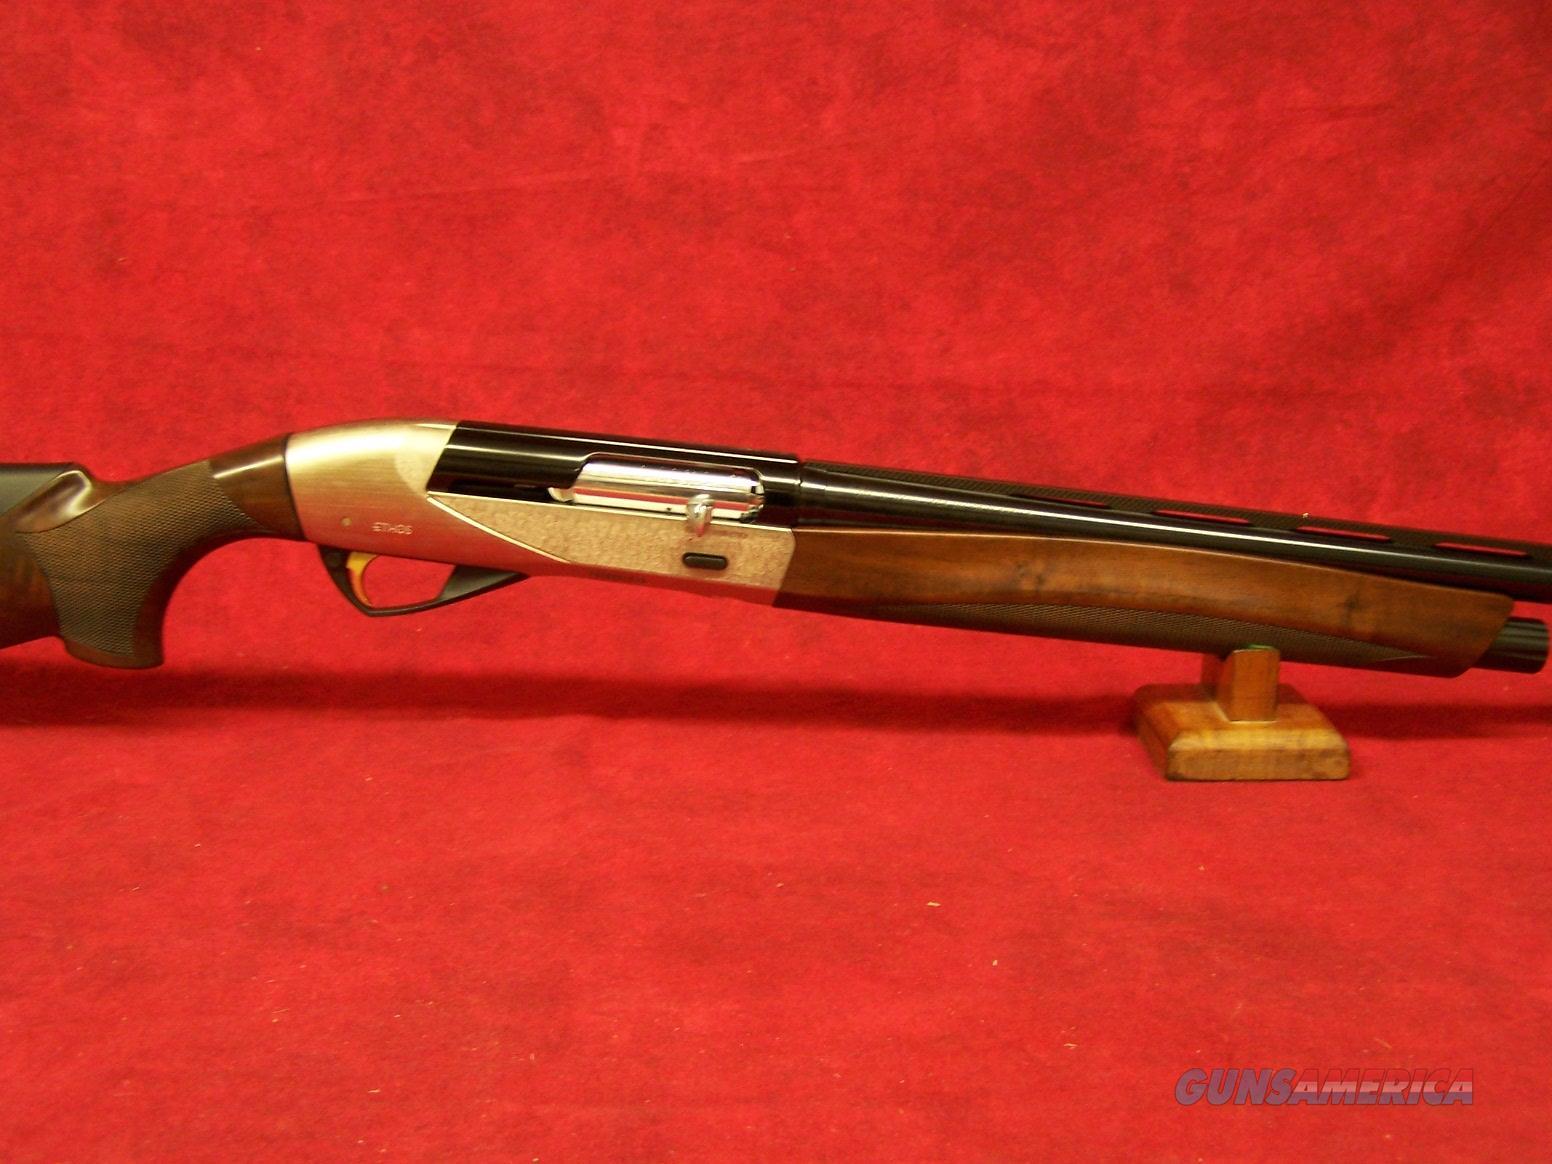 "Benelli Ethos 12 Ga 3"" AA-Grade Satin Walnut Nickel Engraved Progressive Comfort 26"" Barrel (10461)  Guns > Shotguns > Benelli Shotguns > Sporting"